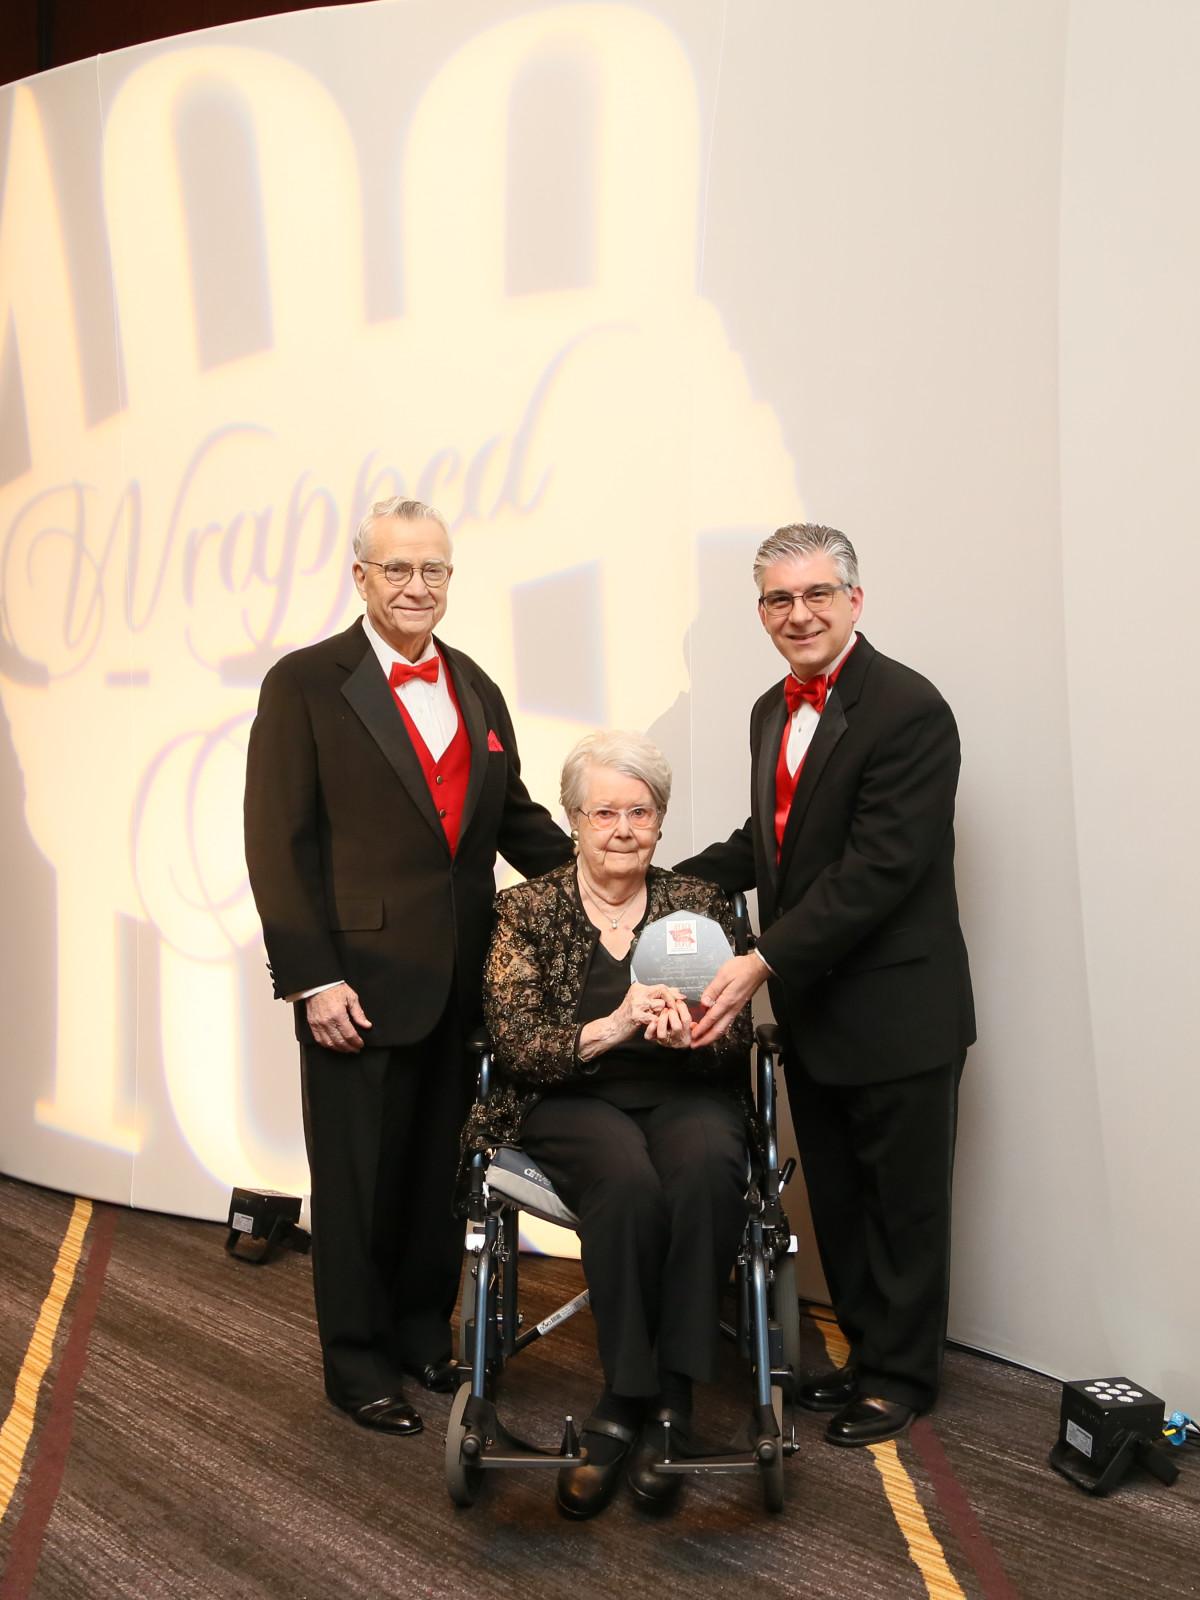 Red Cross Ball, Feb. 2016, Gene McDavid, Betty McDavid, Steve Vetrano